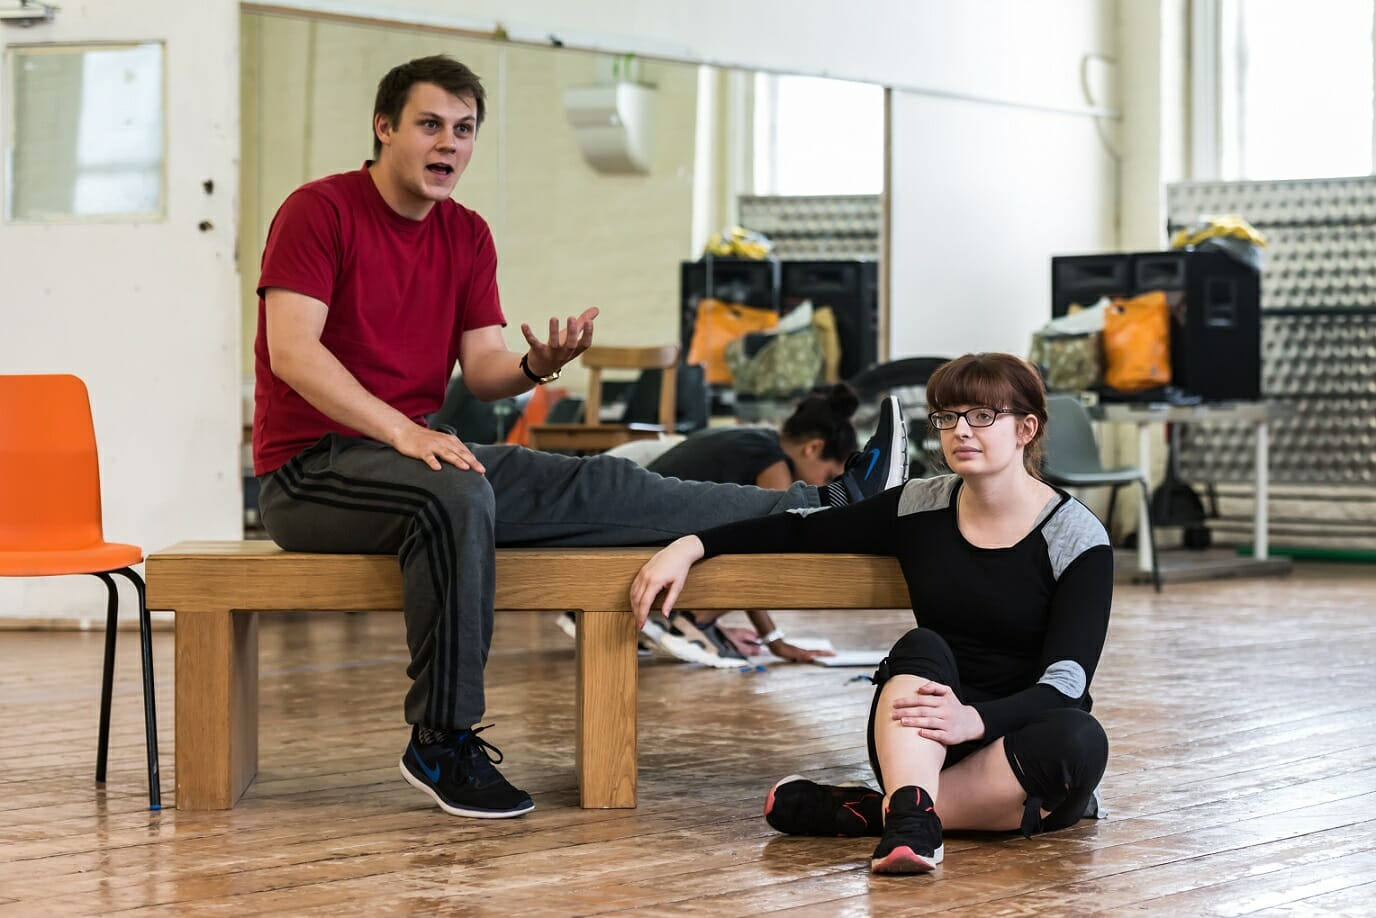 The Quentin Dentin Show - Max Panks and Shauna Riley (courtesy of Lidia Crisafulli)